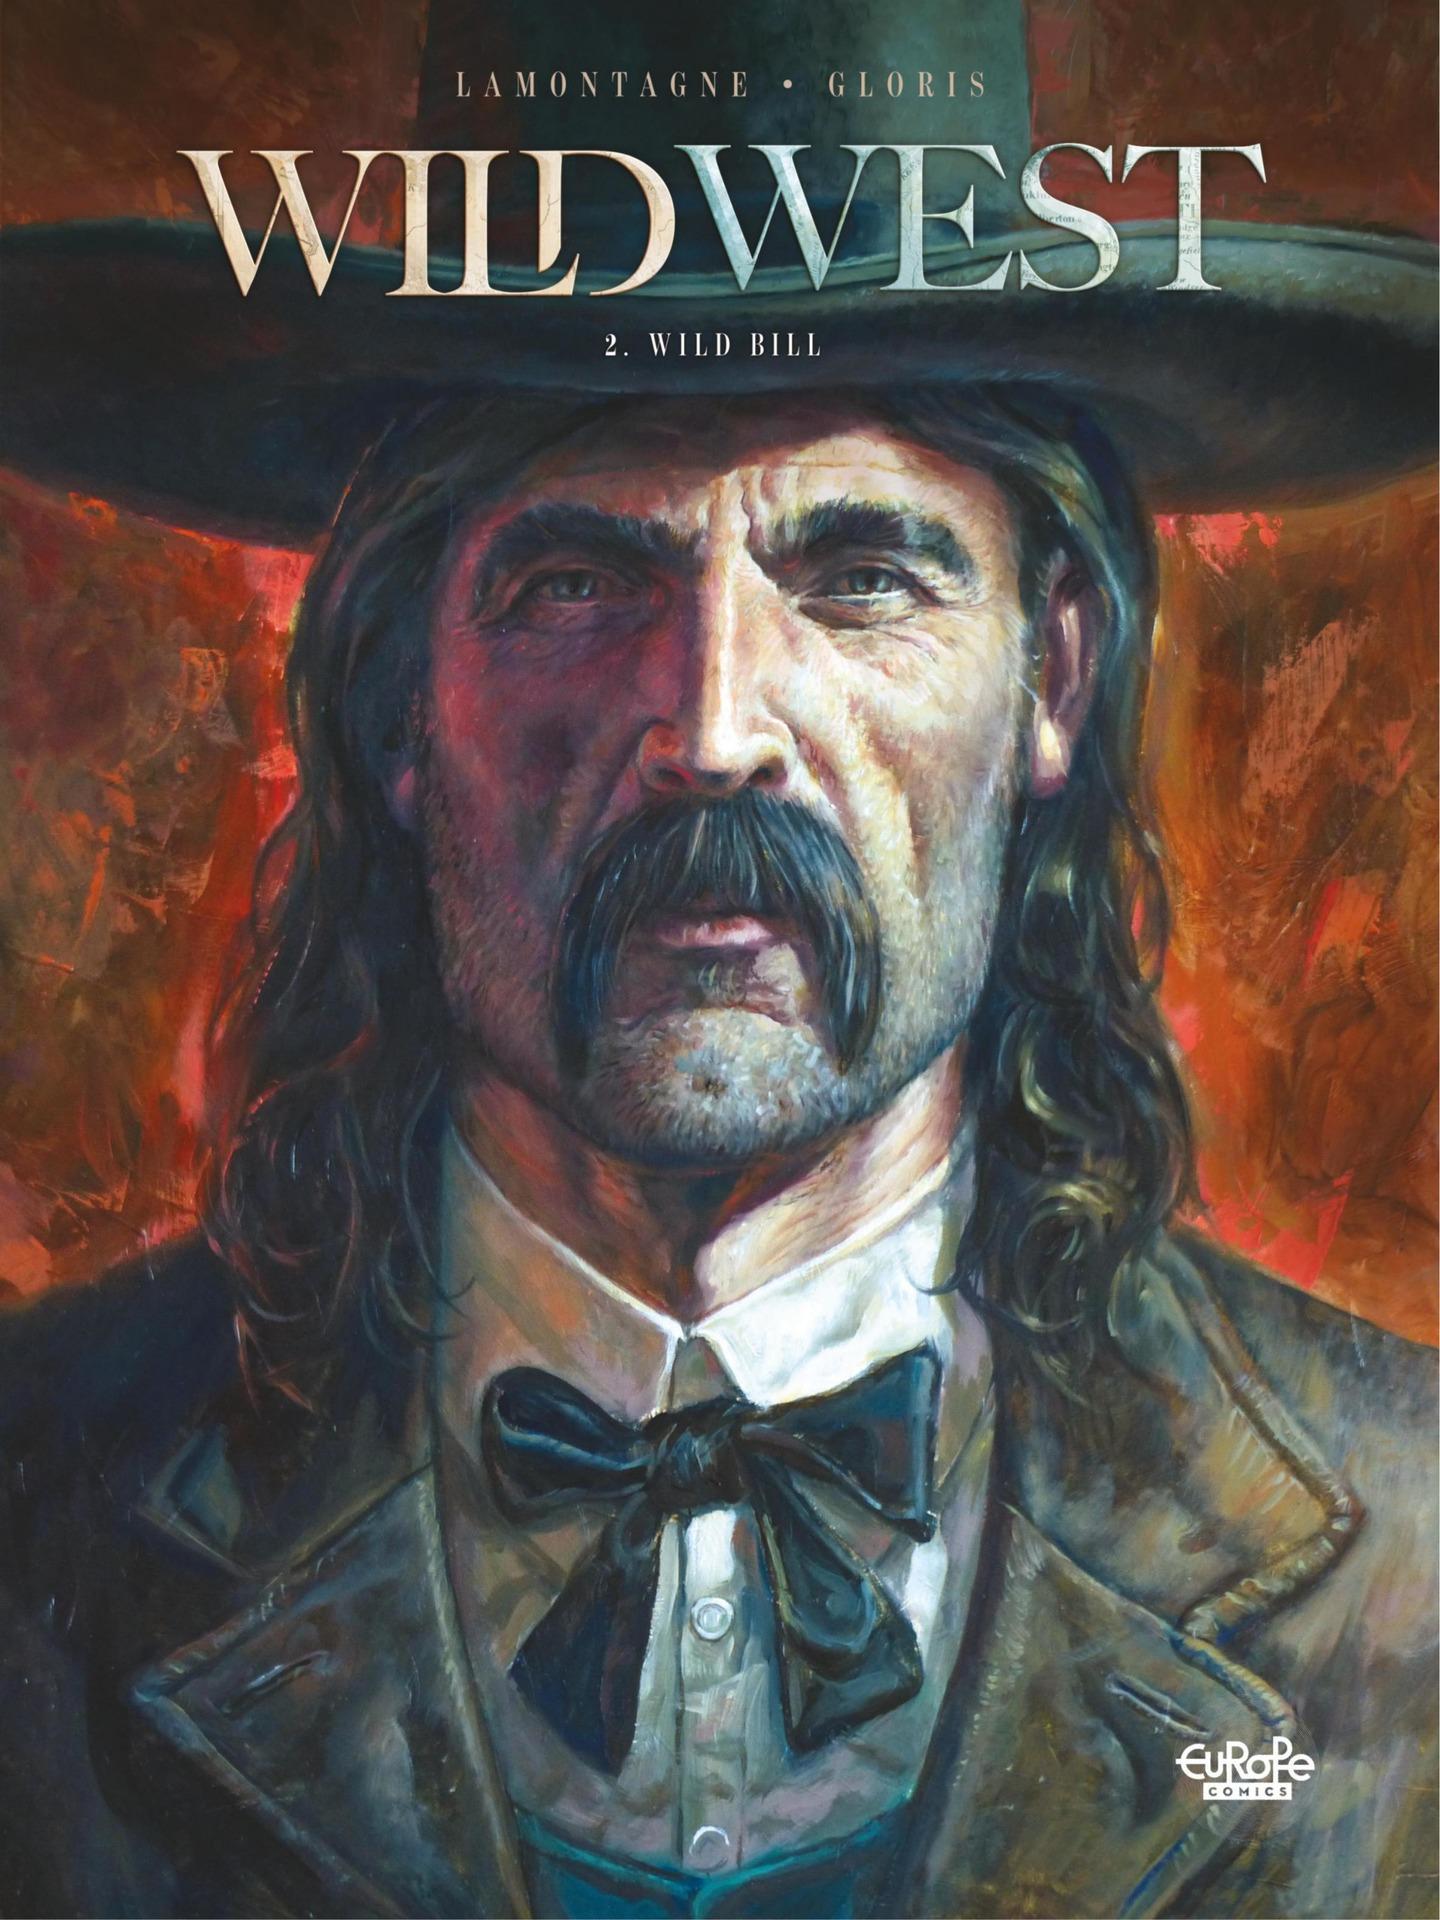 Wild West 02 - Wild Bill (Europe Comics 2021) (webrip) (MagicMan-DCP